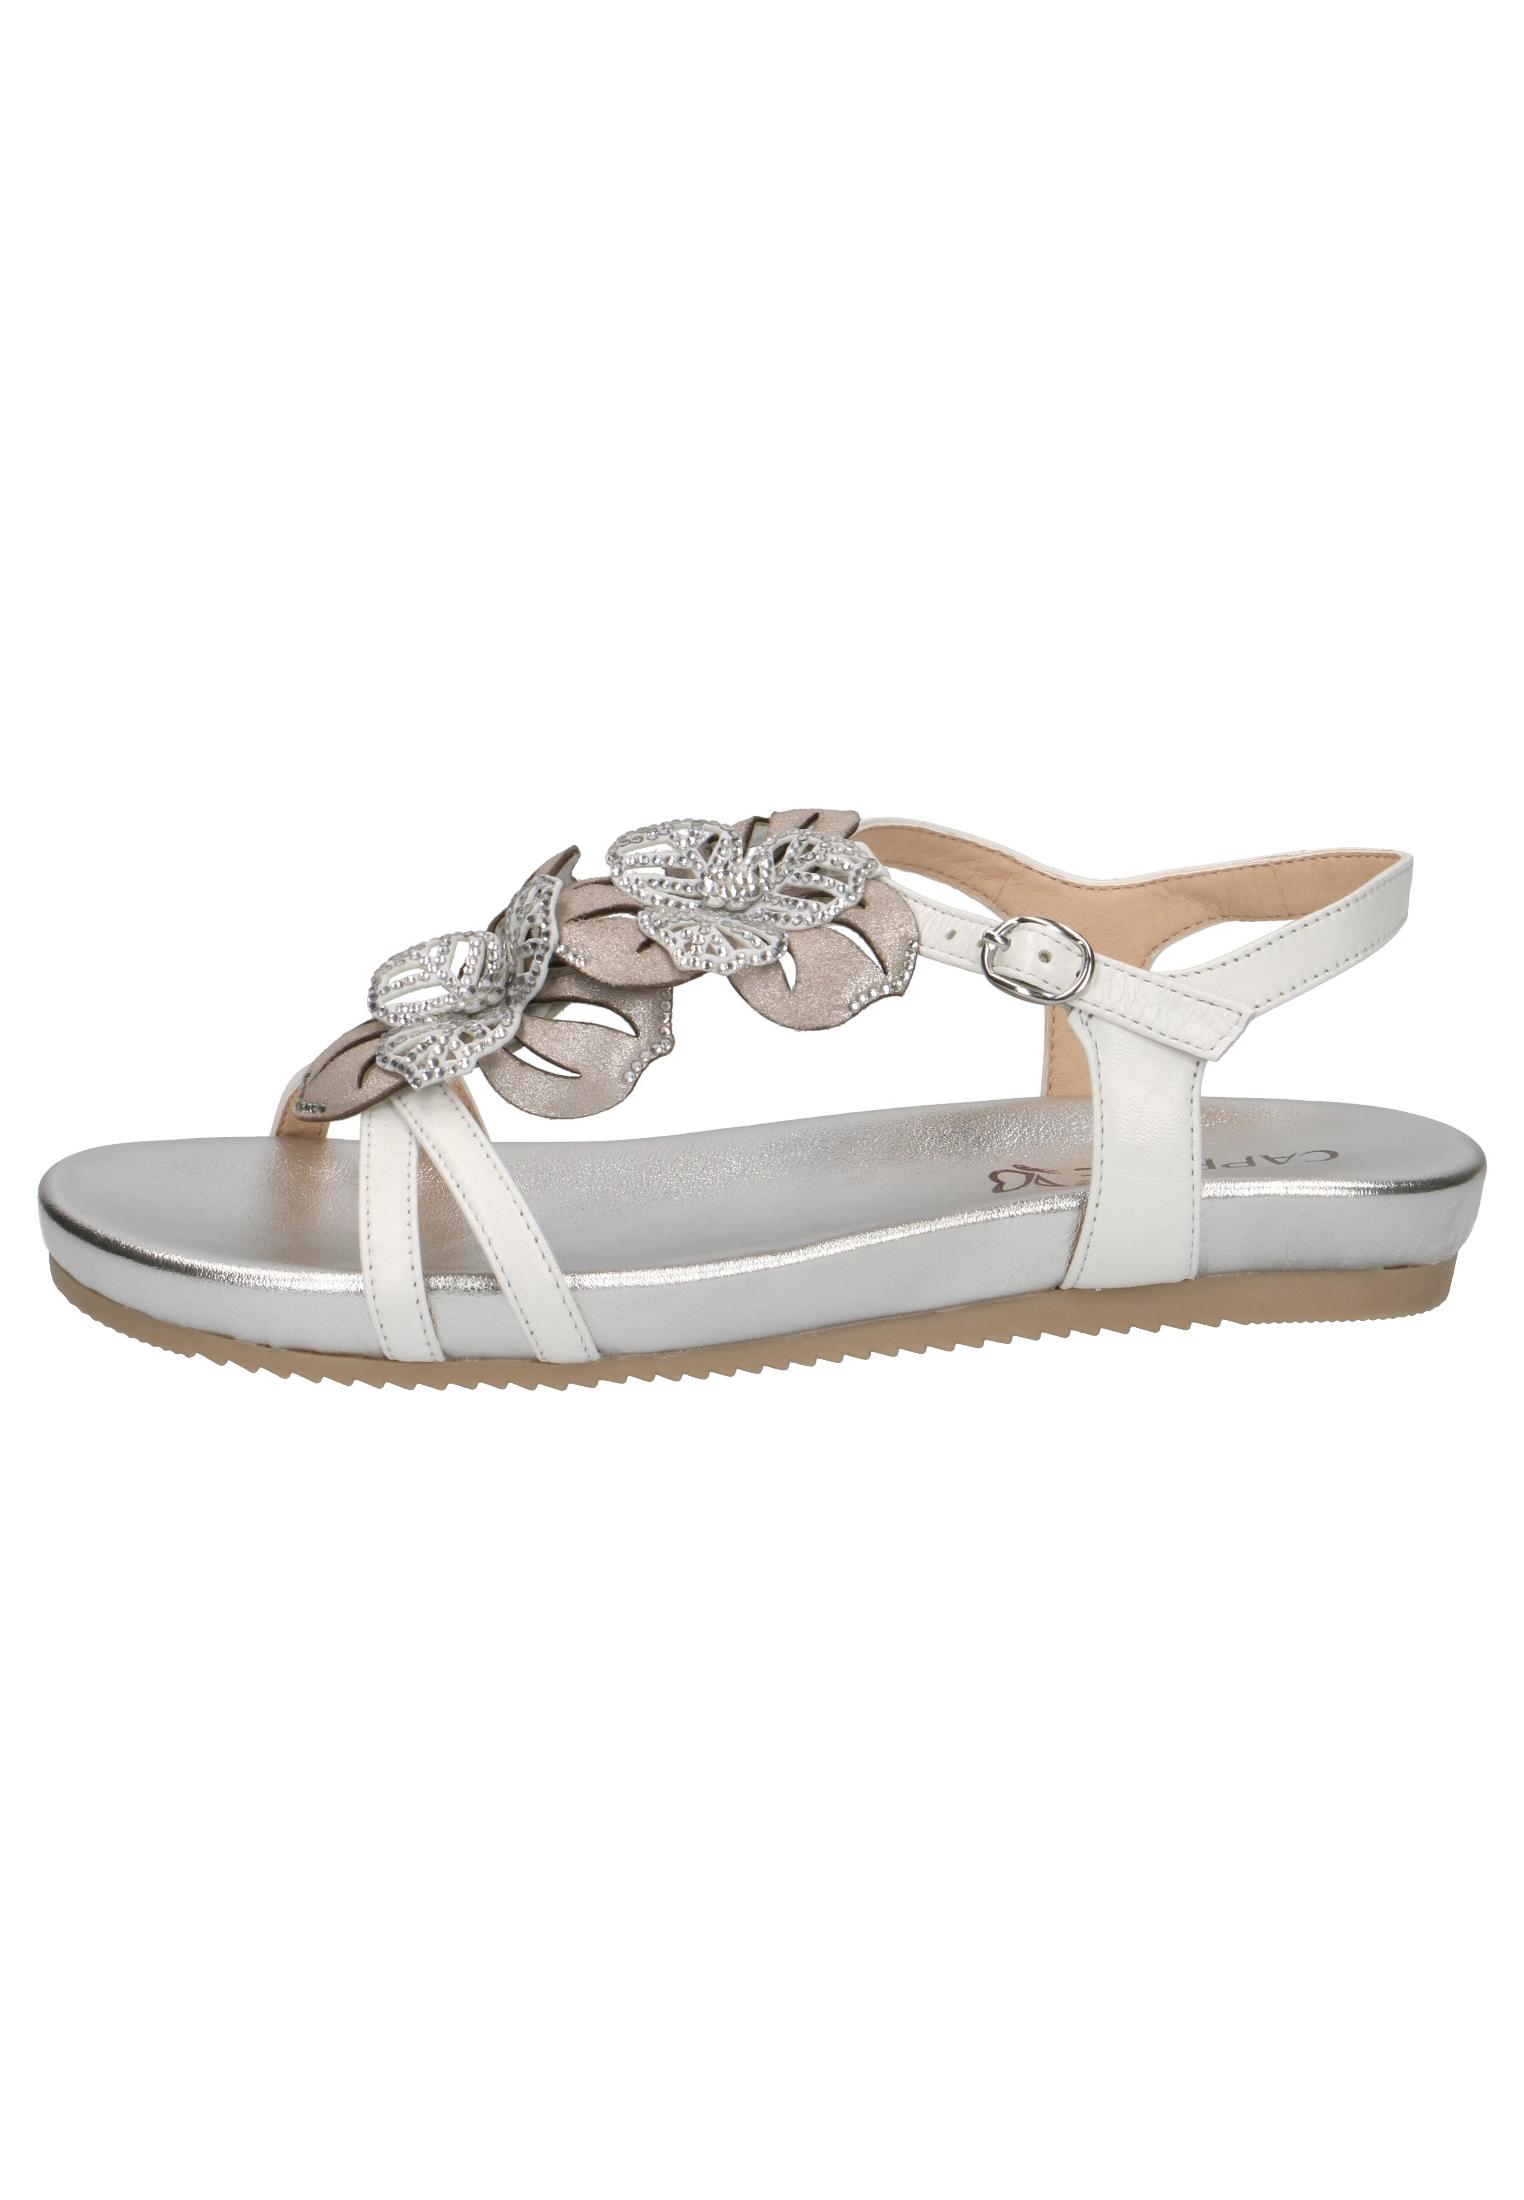 best sneakers 77e6c b19a8 Caprice Damen Sandale Sandalette Weiss 9-28107-22 197 White Comb